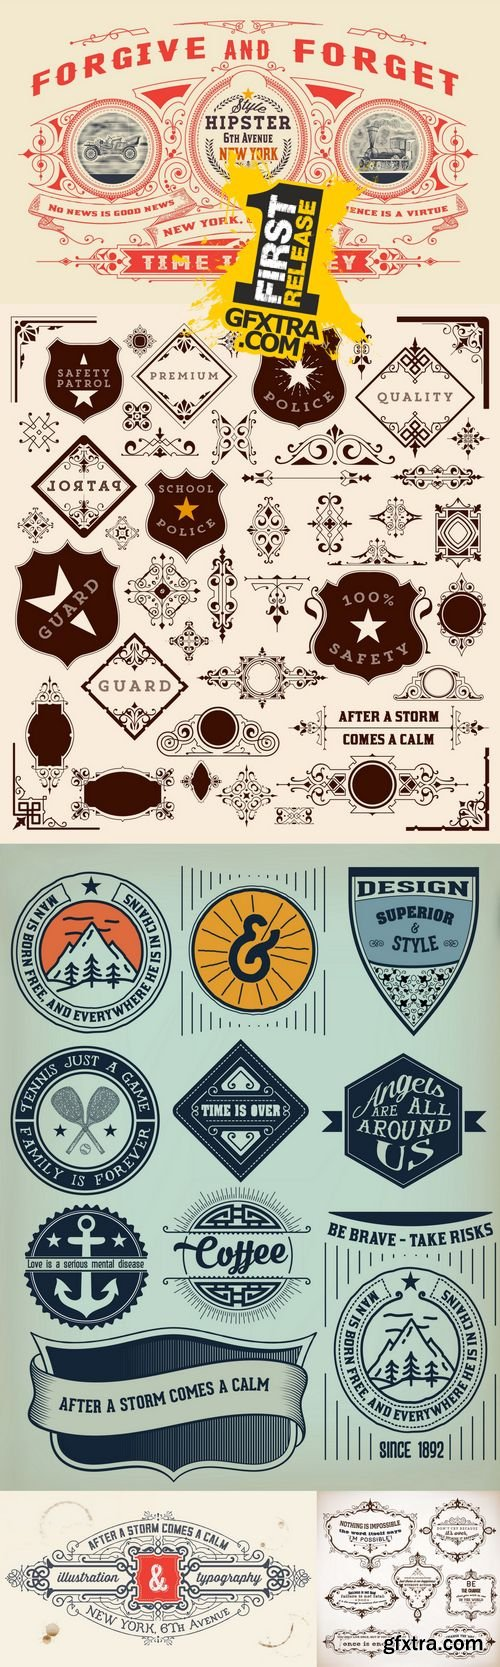 Vector - Vintage Design Elements